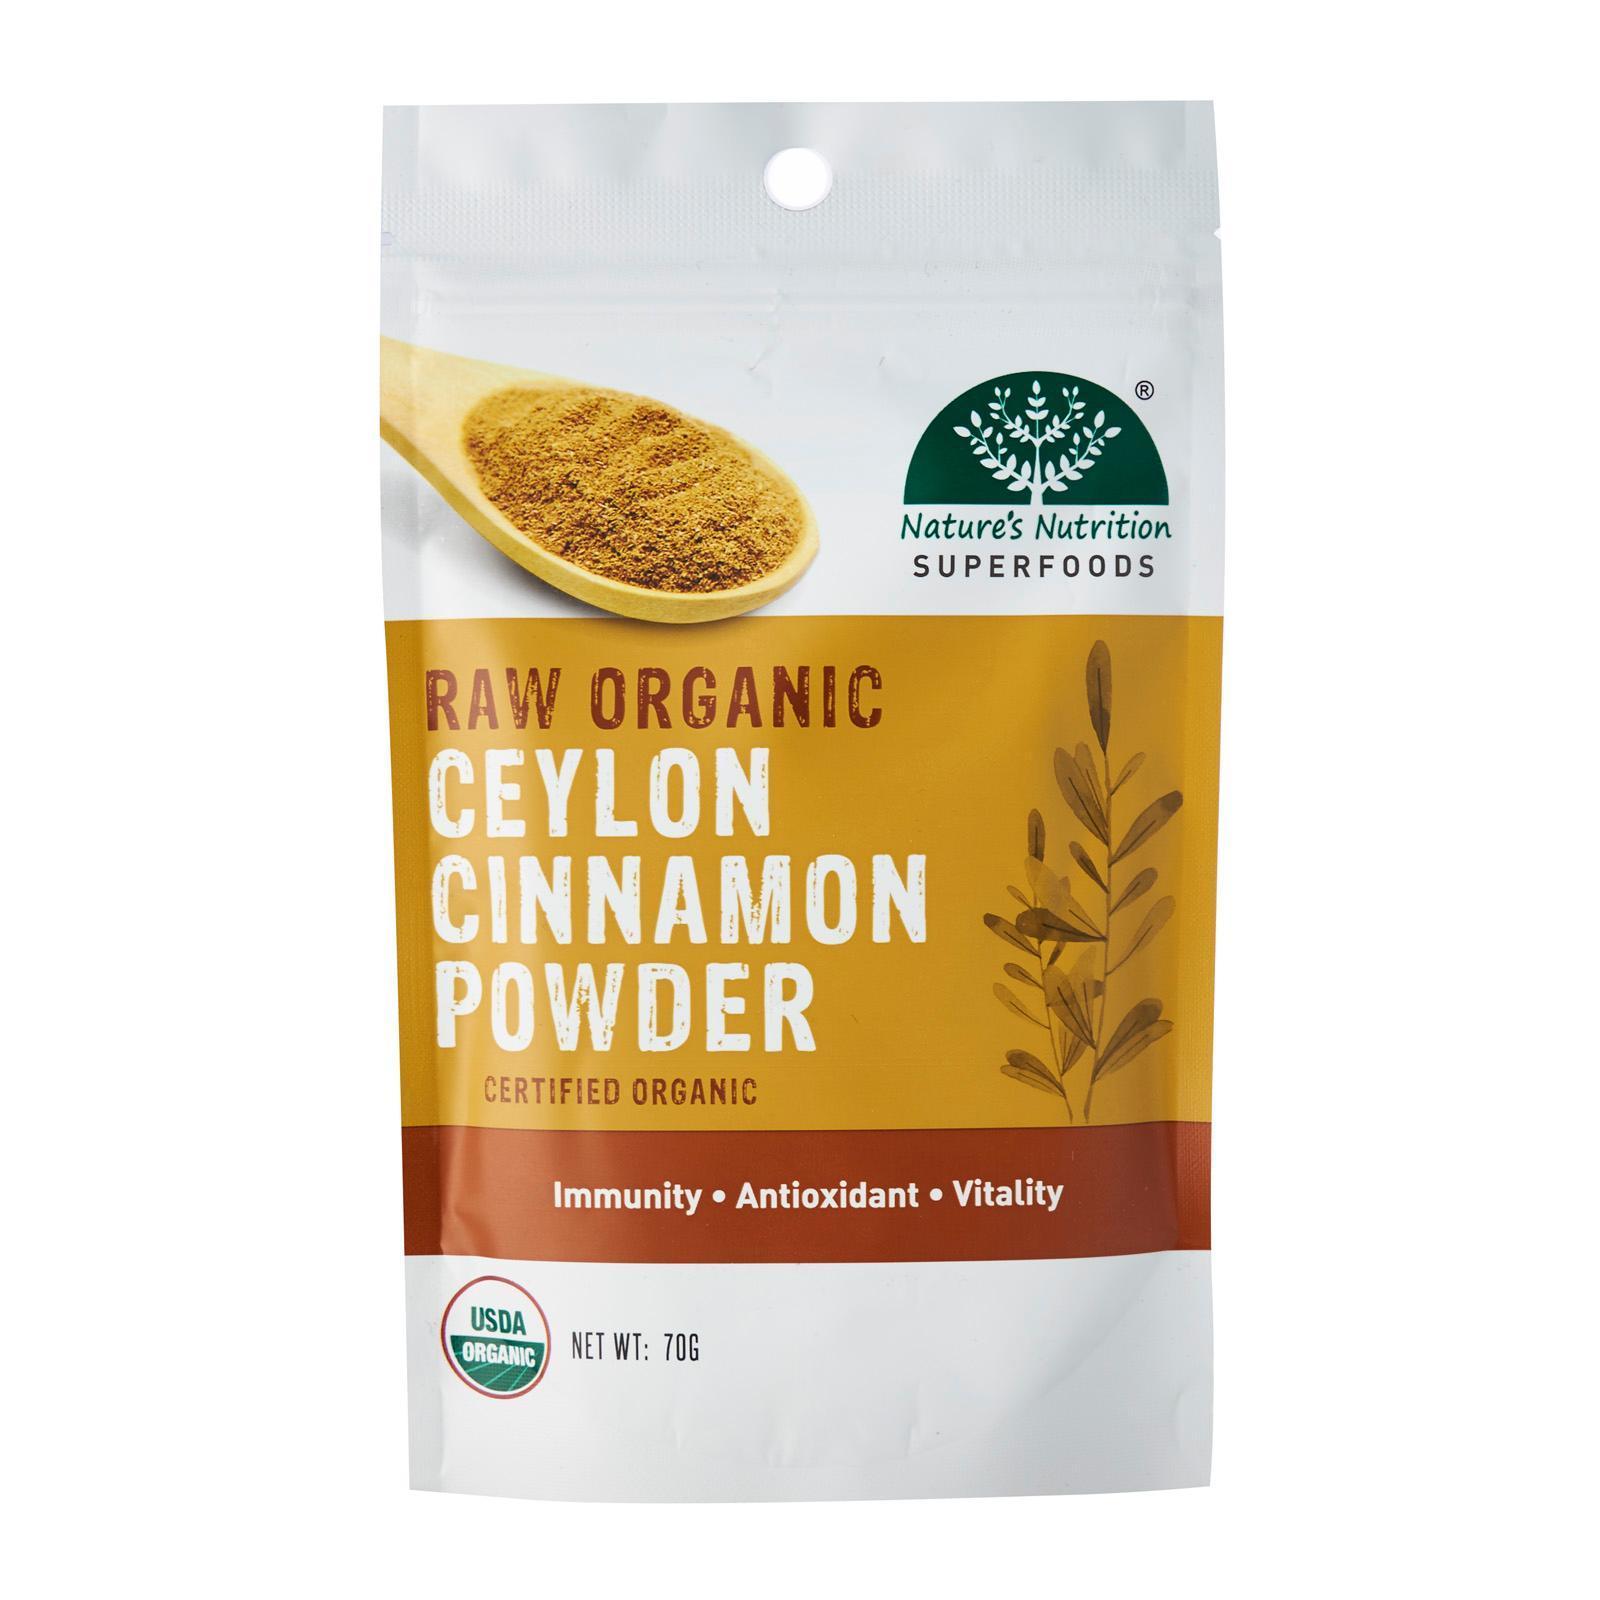 Nature's Nutrition Raw Organic Ceylon Cinnamon Powder